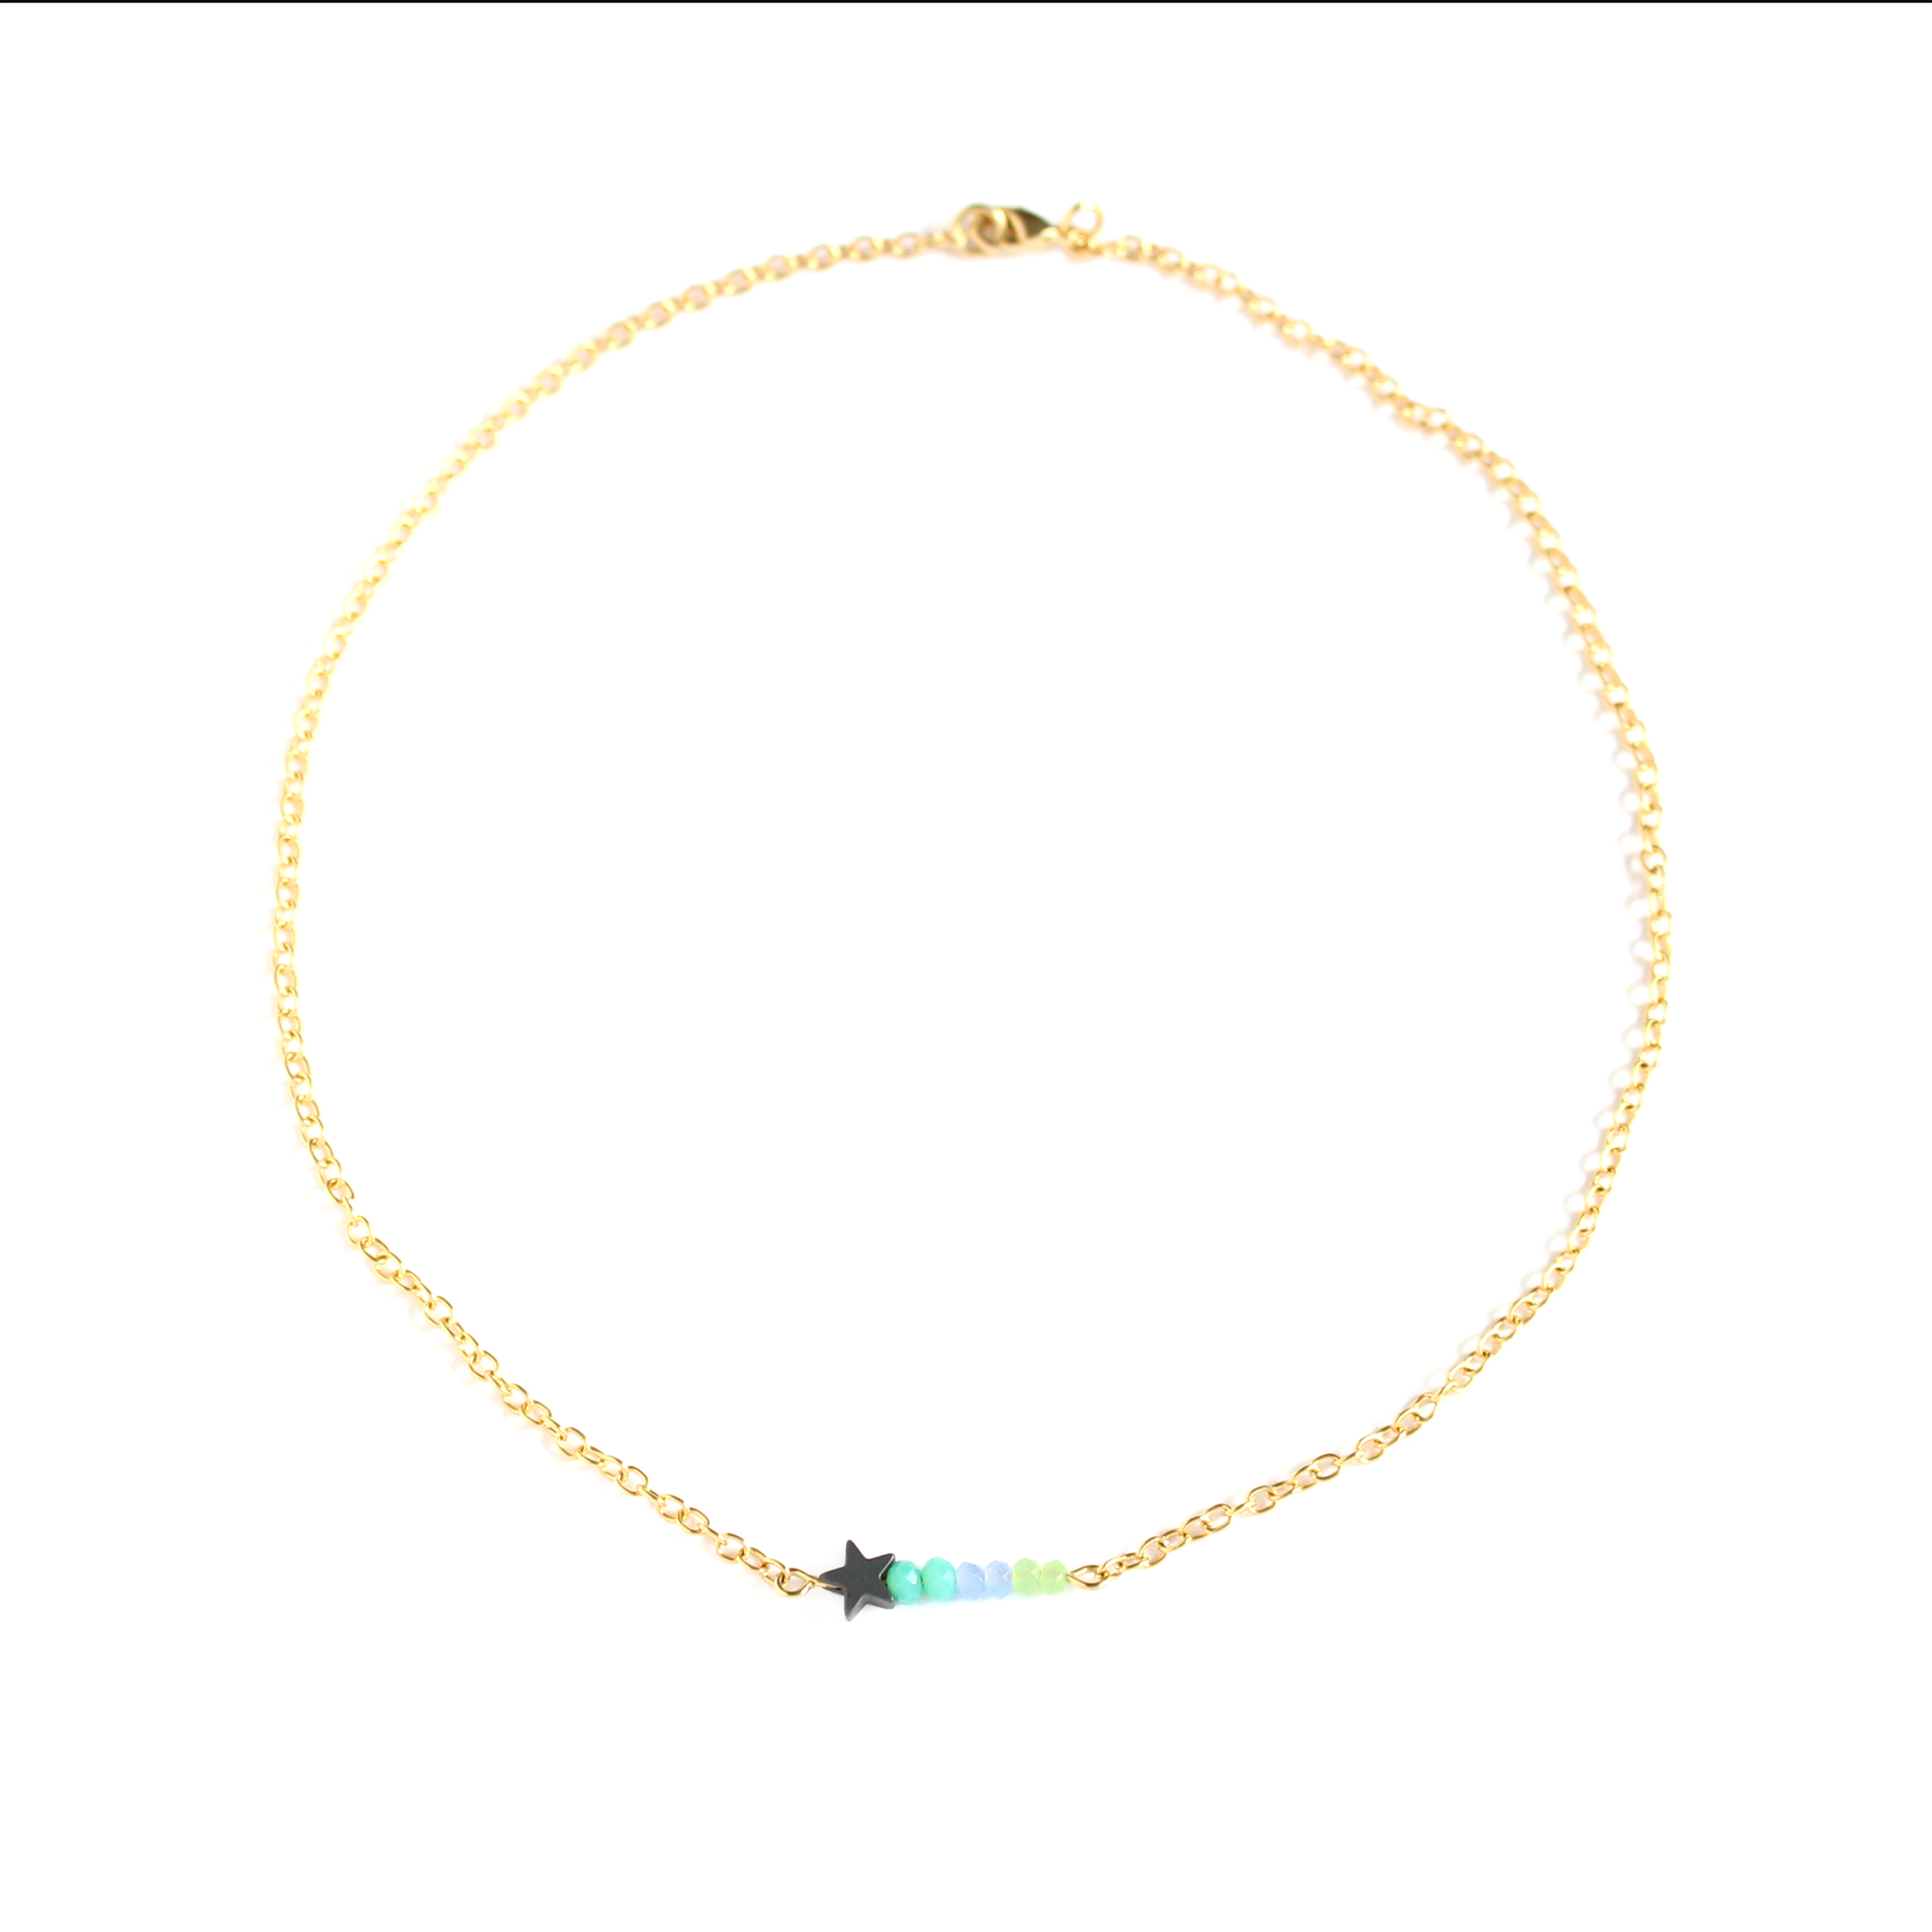 Collar con cadena de 2,3 mm de ancho Summer secrets